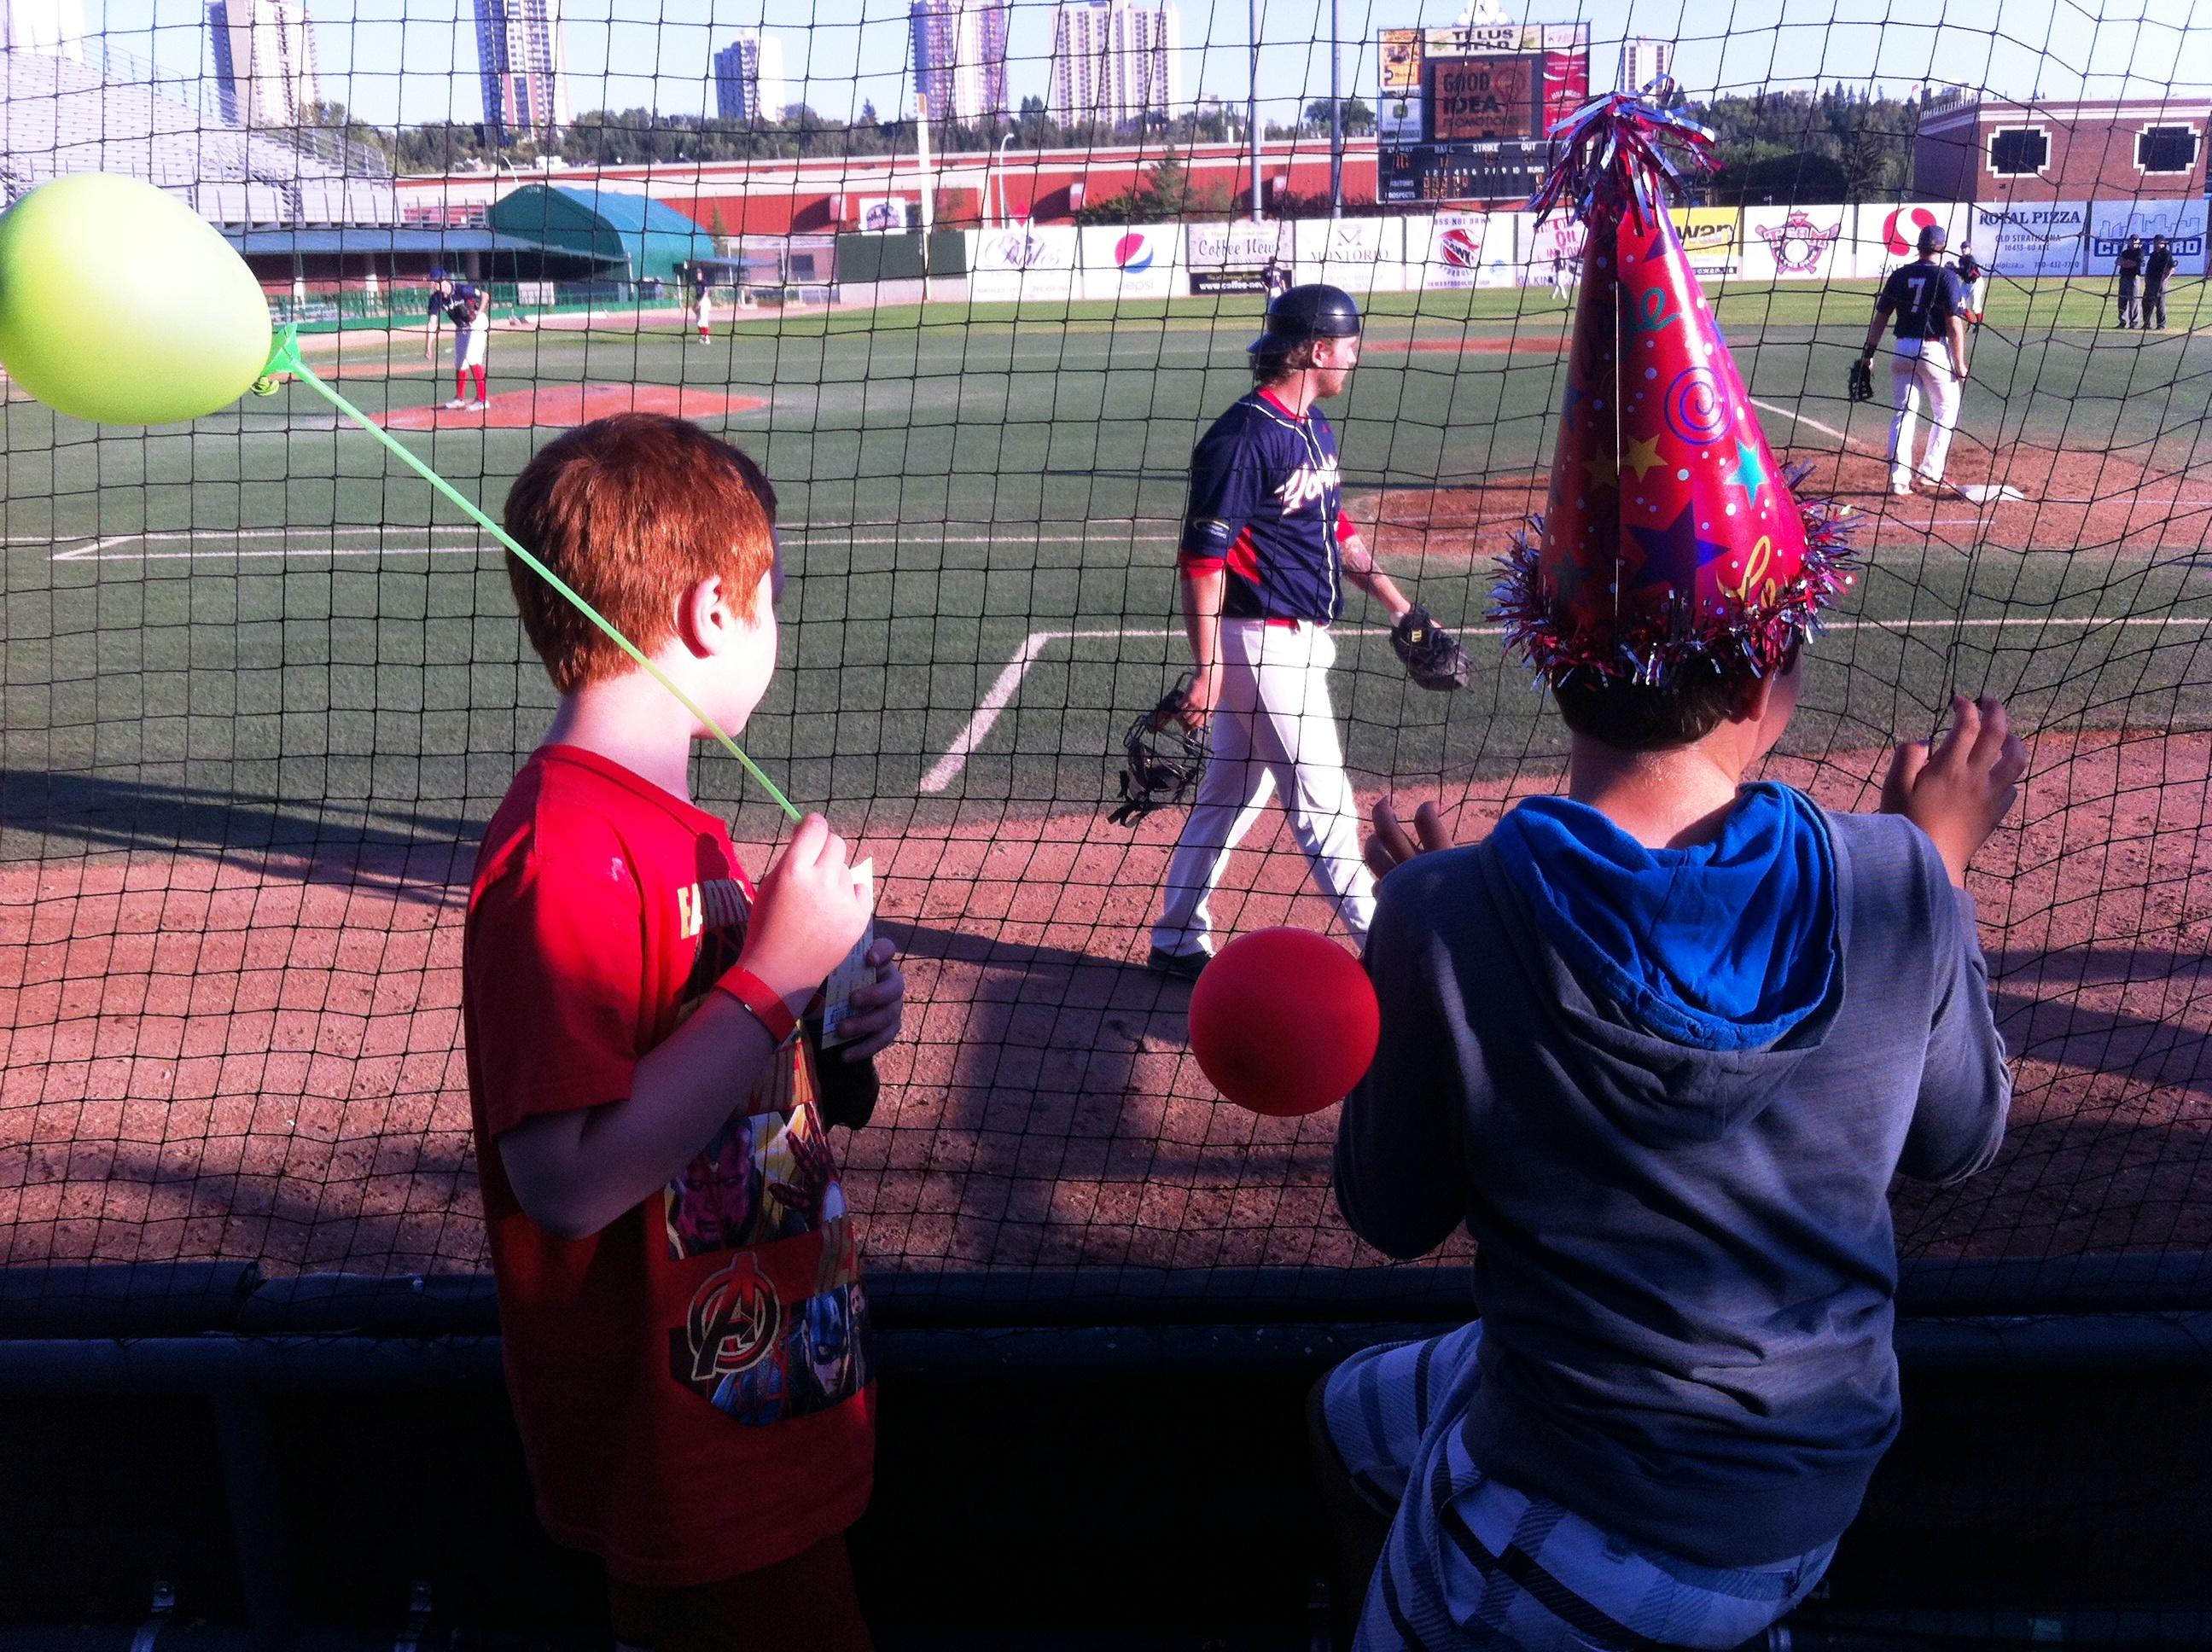 Edmonton Prospects Baseball Games - A Family Hit! #Edmonton #Basebal #Prospects #Family #fun #attraction #review #birthday